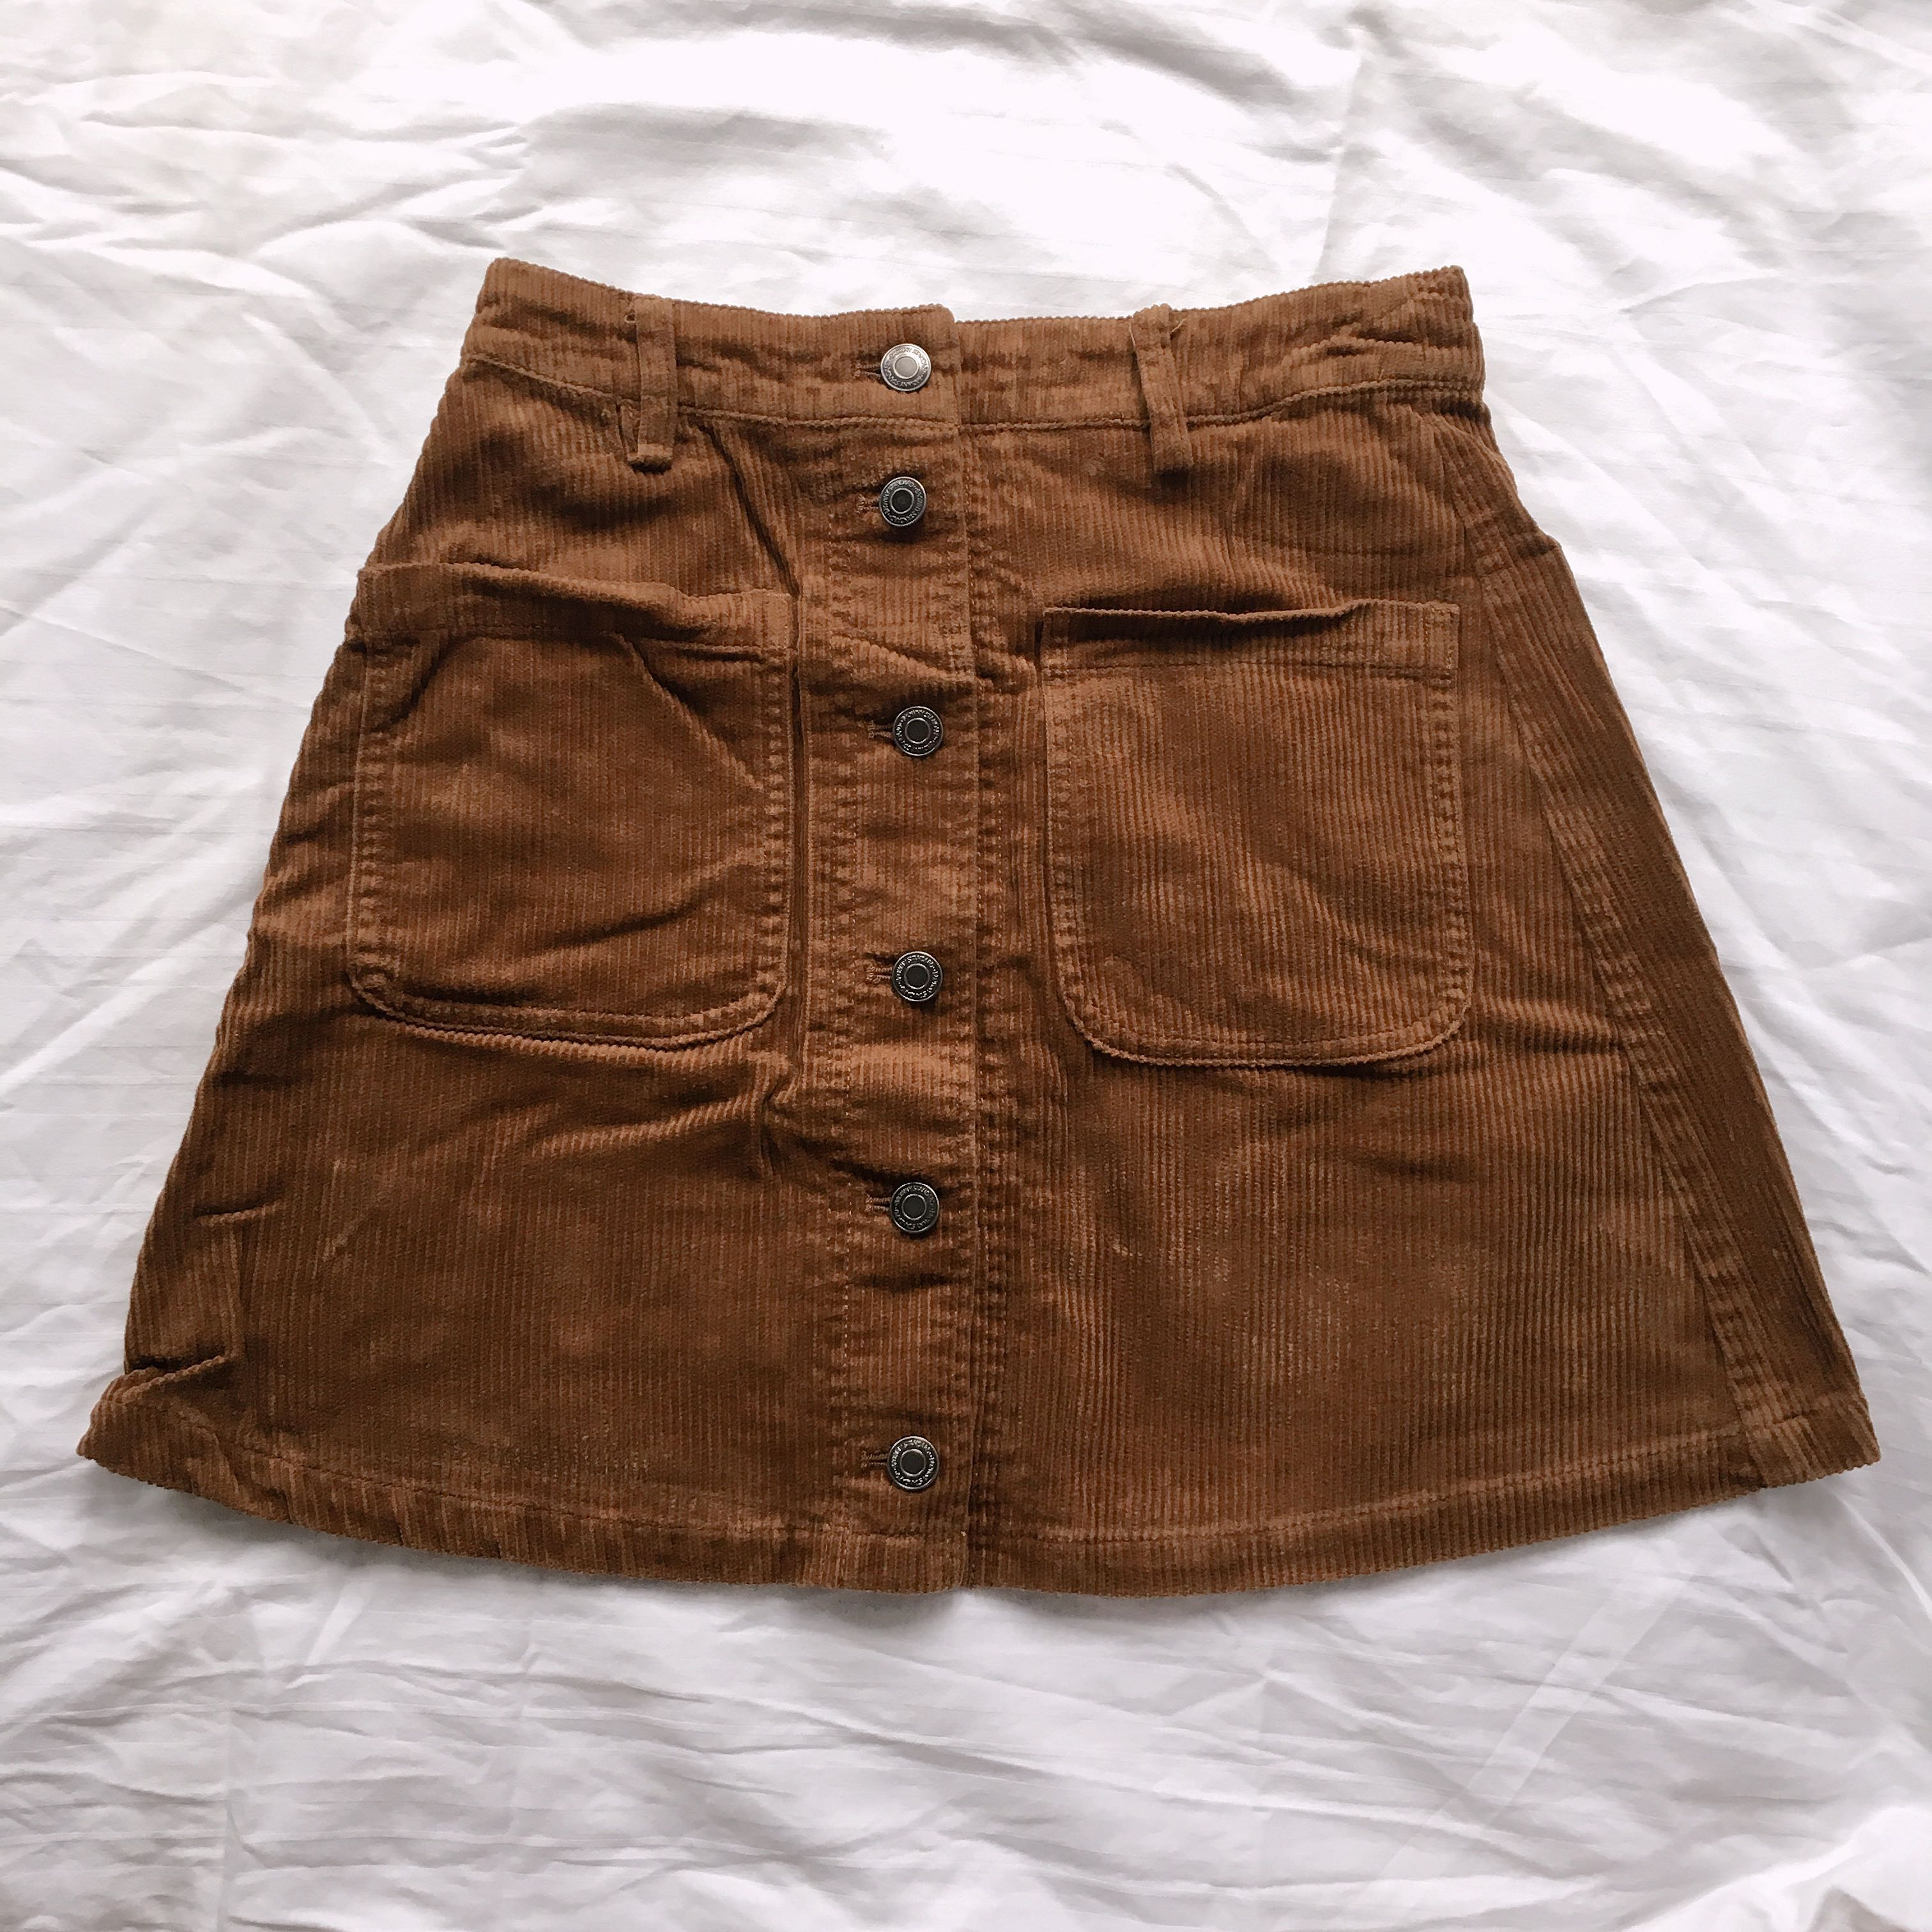 089f2e29b2 Brown Corduroy Button Up Skirt